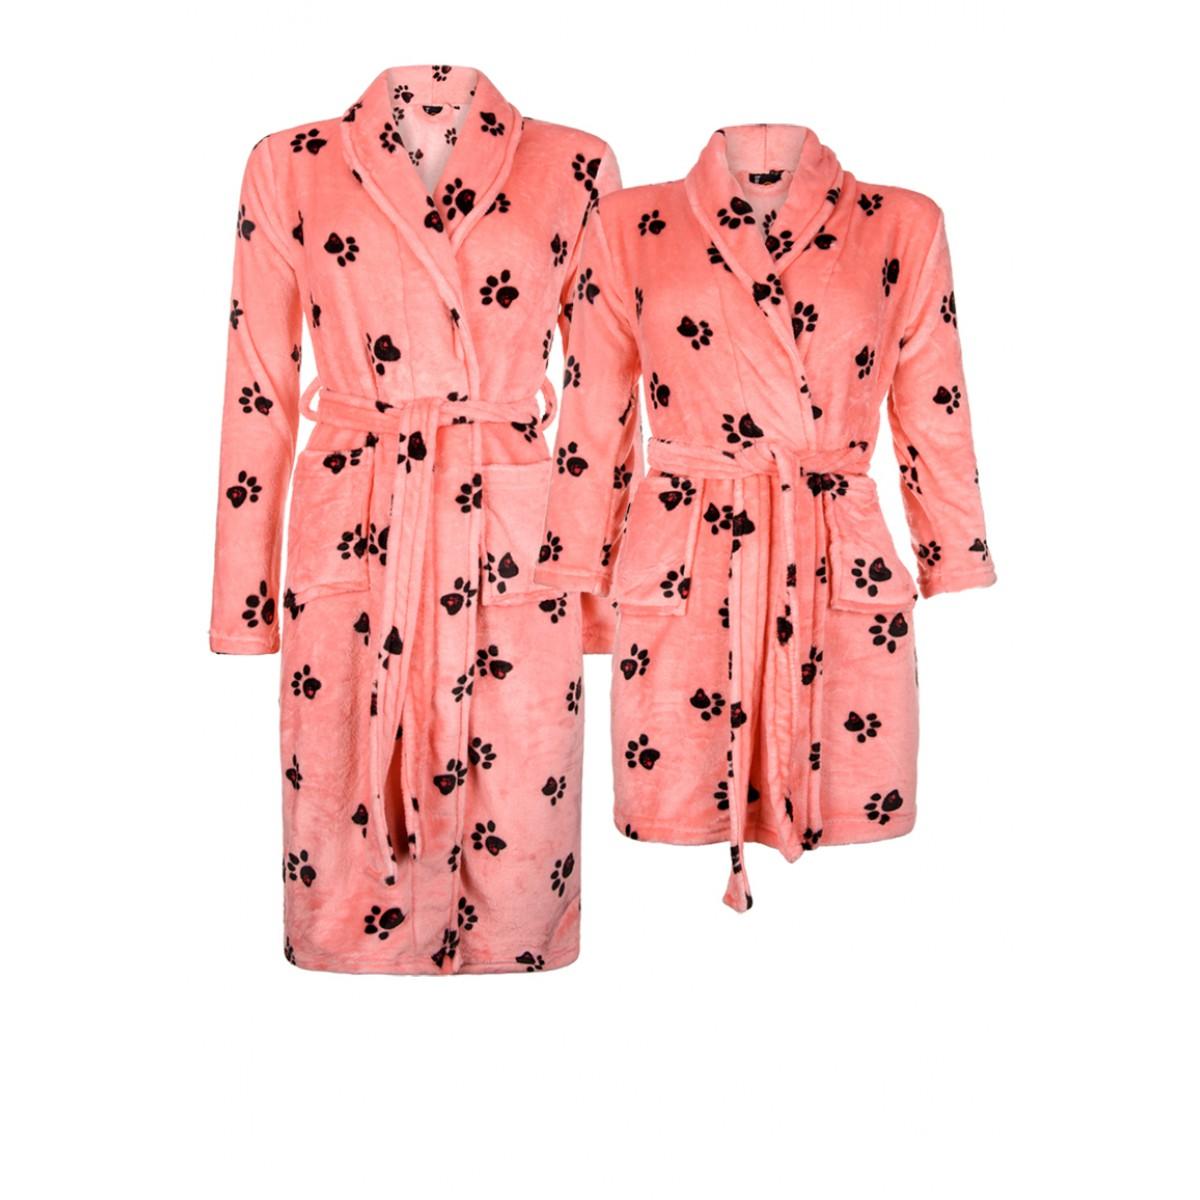 roze badjas hond